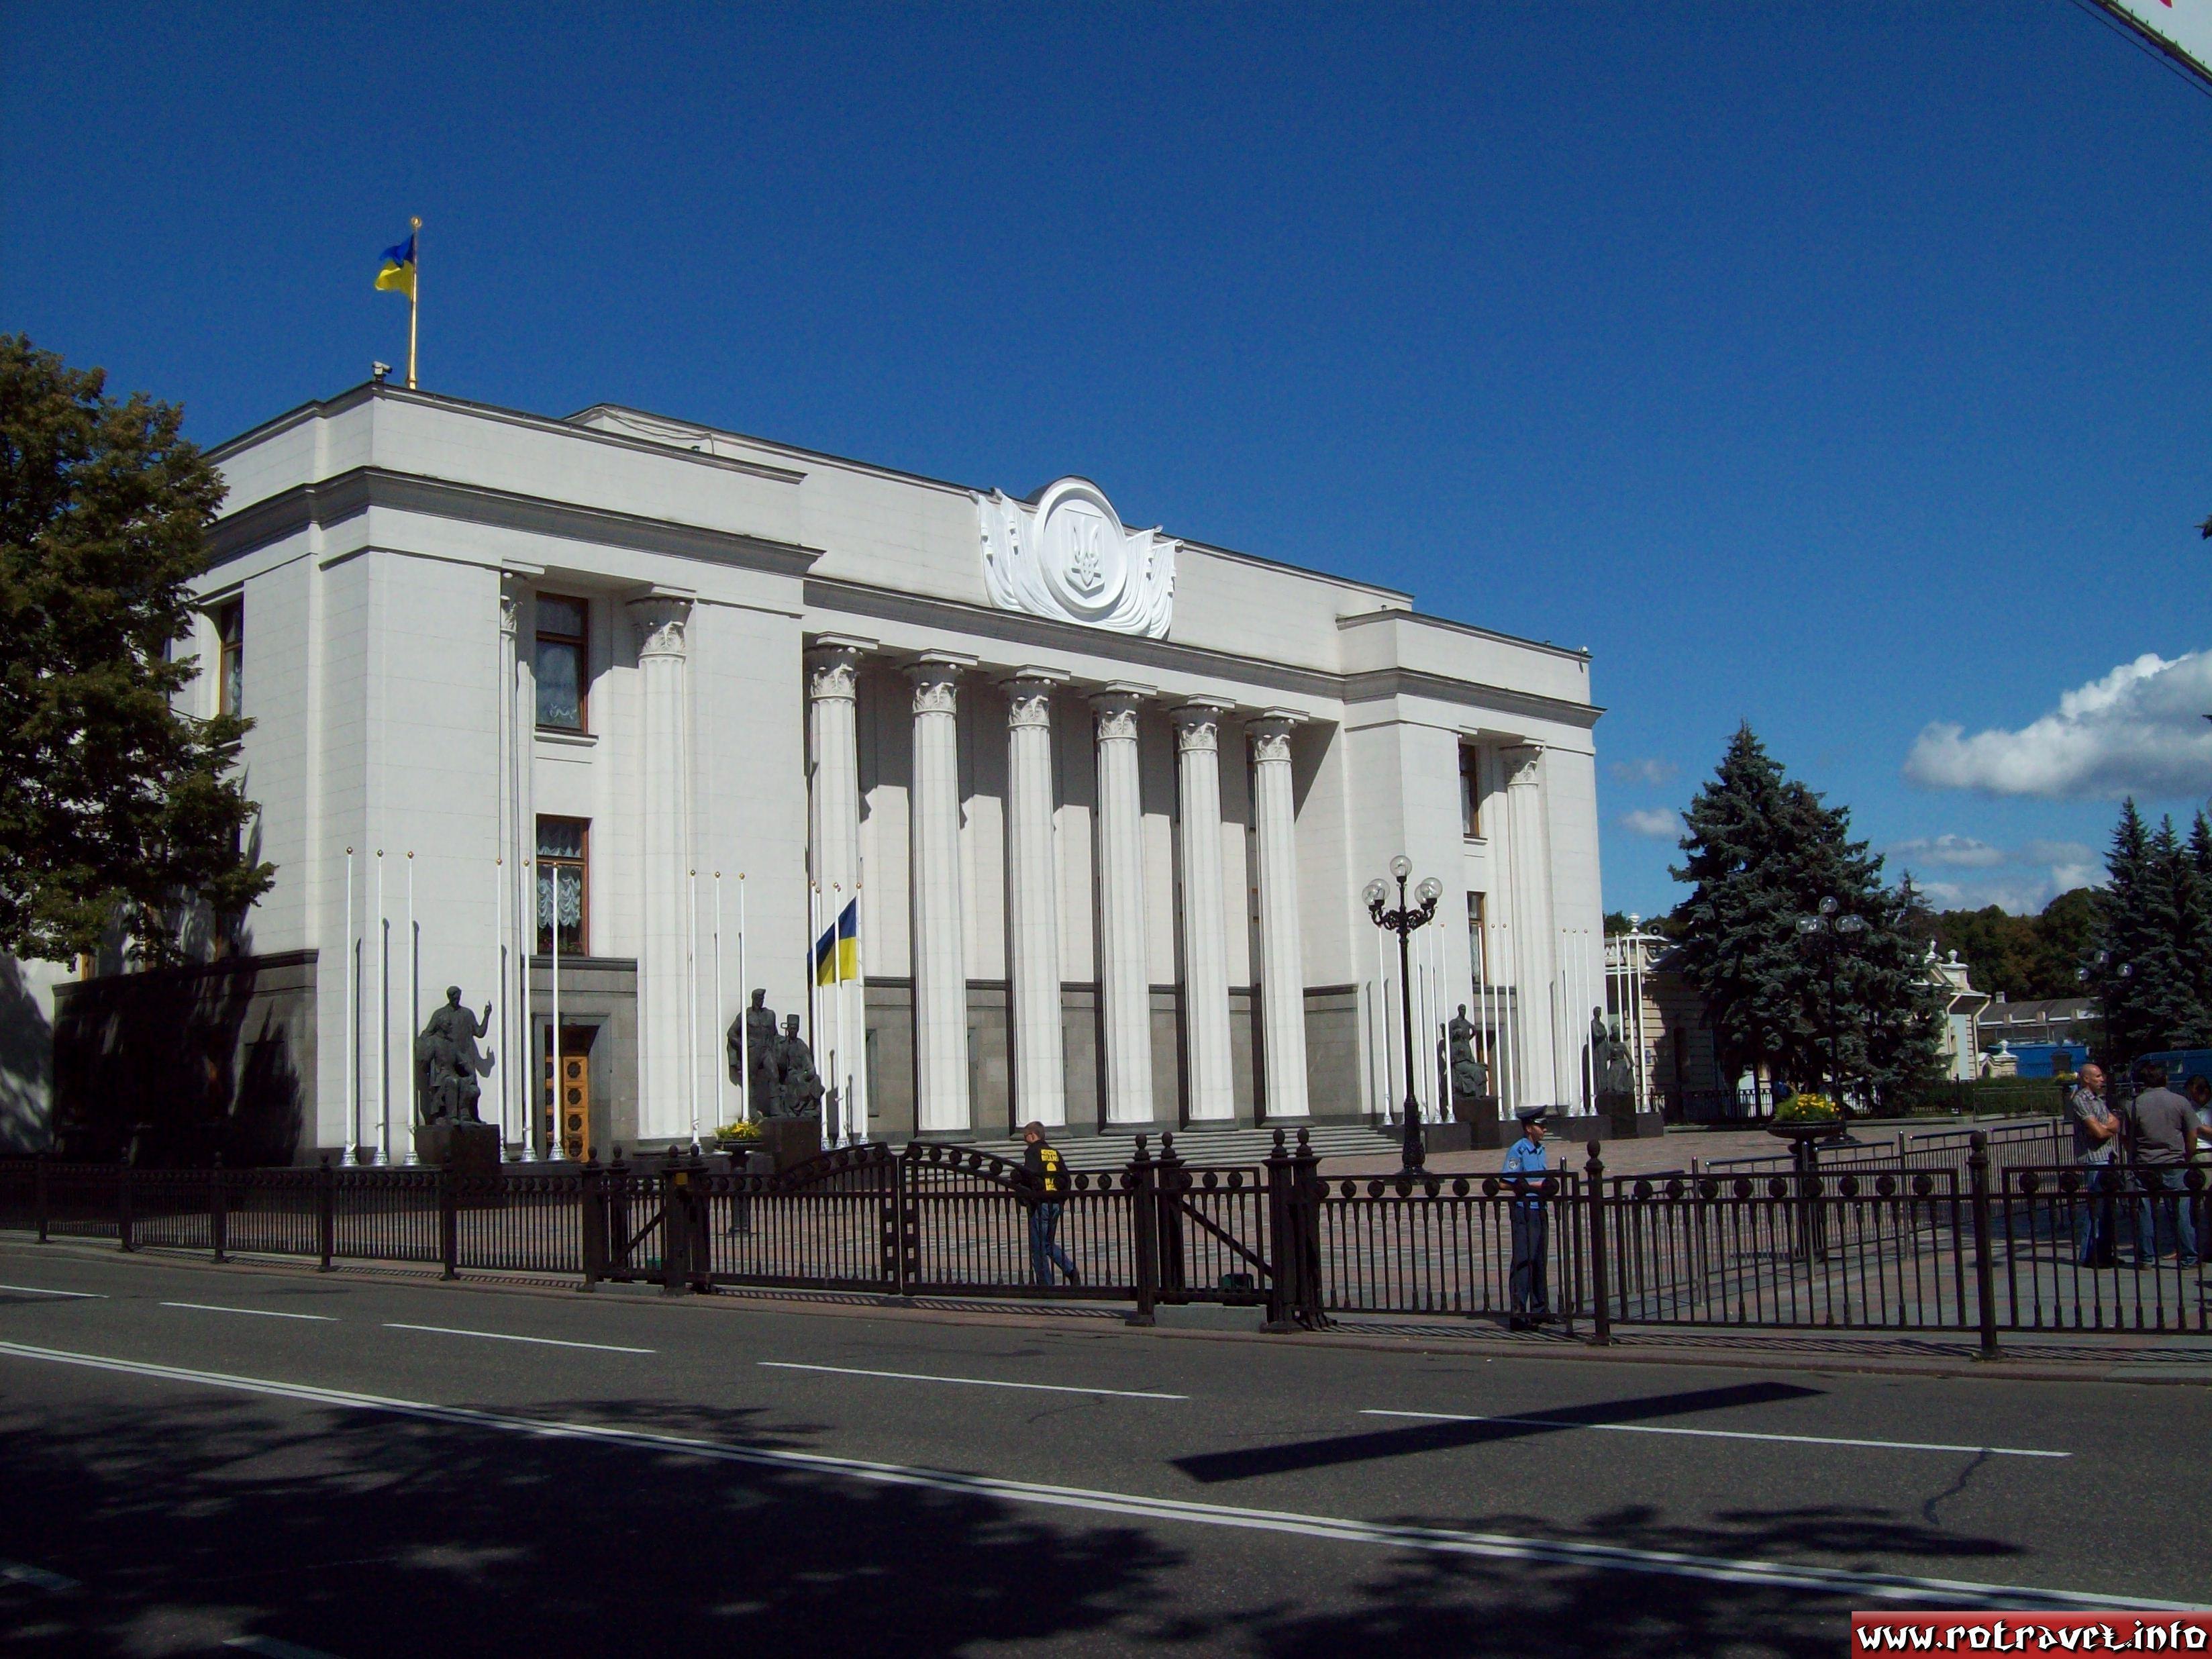 The Verkhovna Rada of Ukraine (Ukrainian: Верховна Рада України; English: Supreme Council of Ukraine) is Ukraine's parliament.